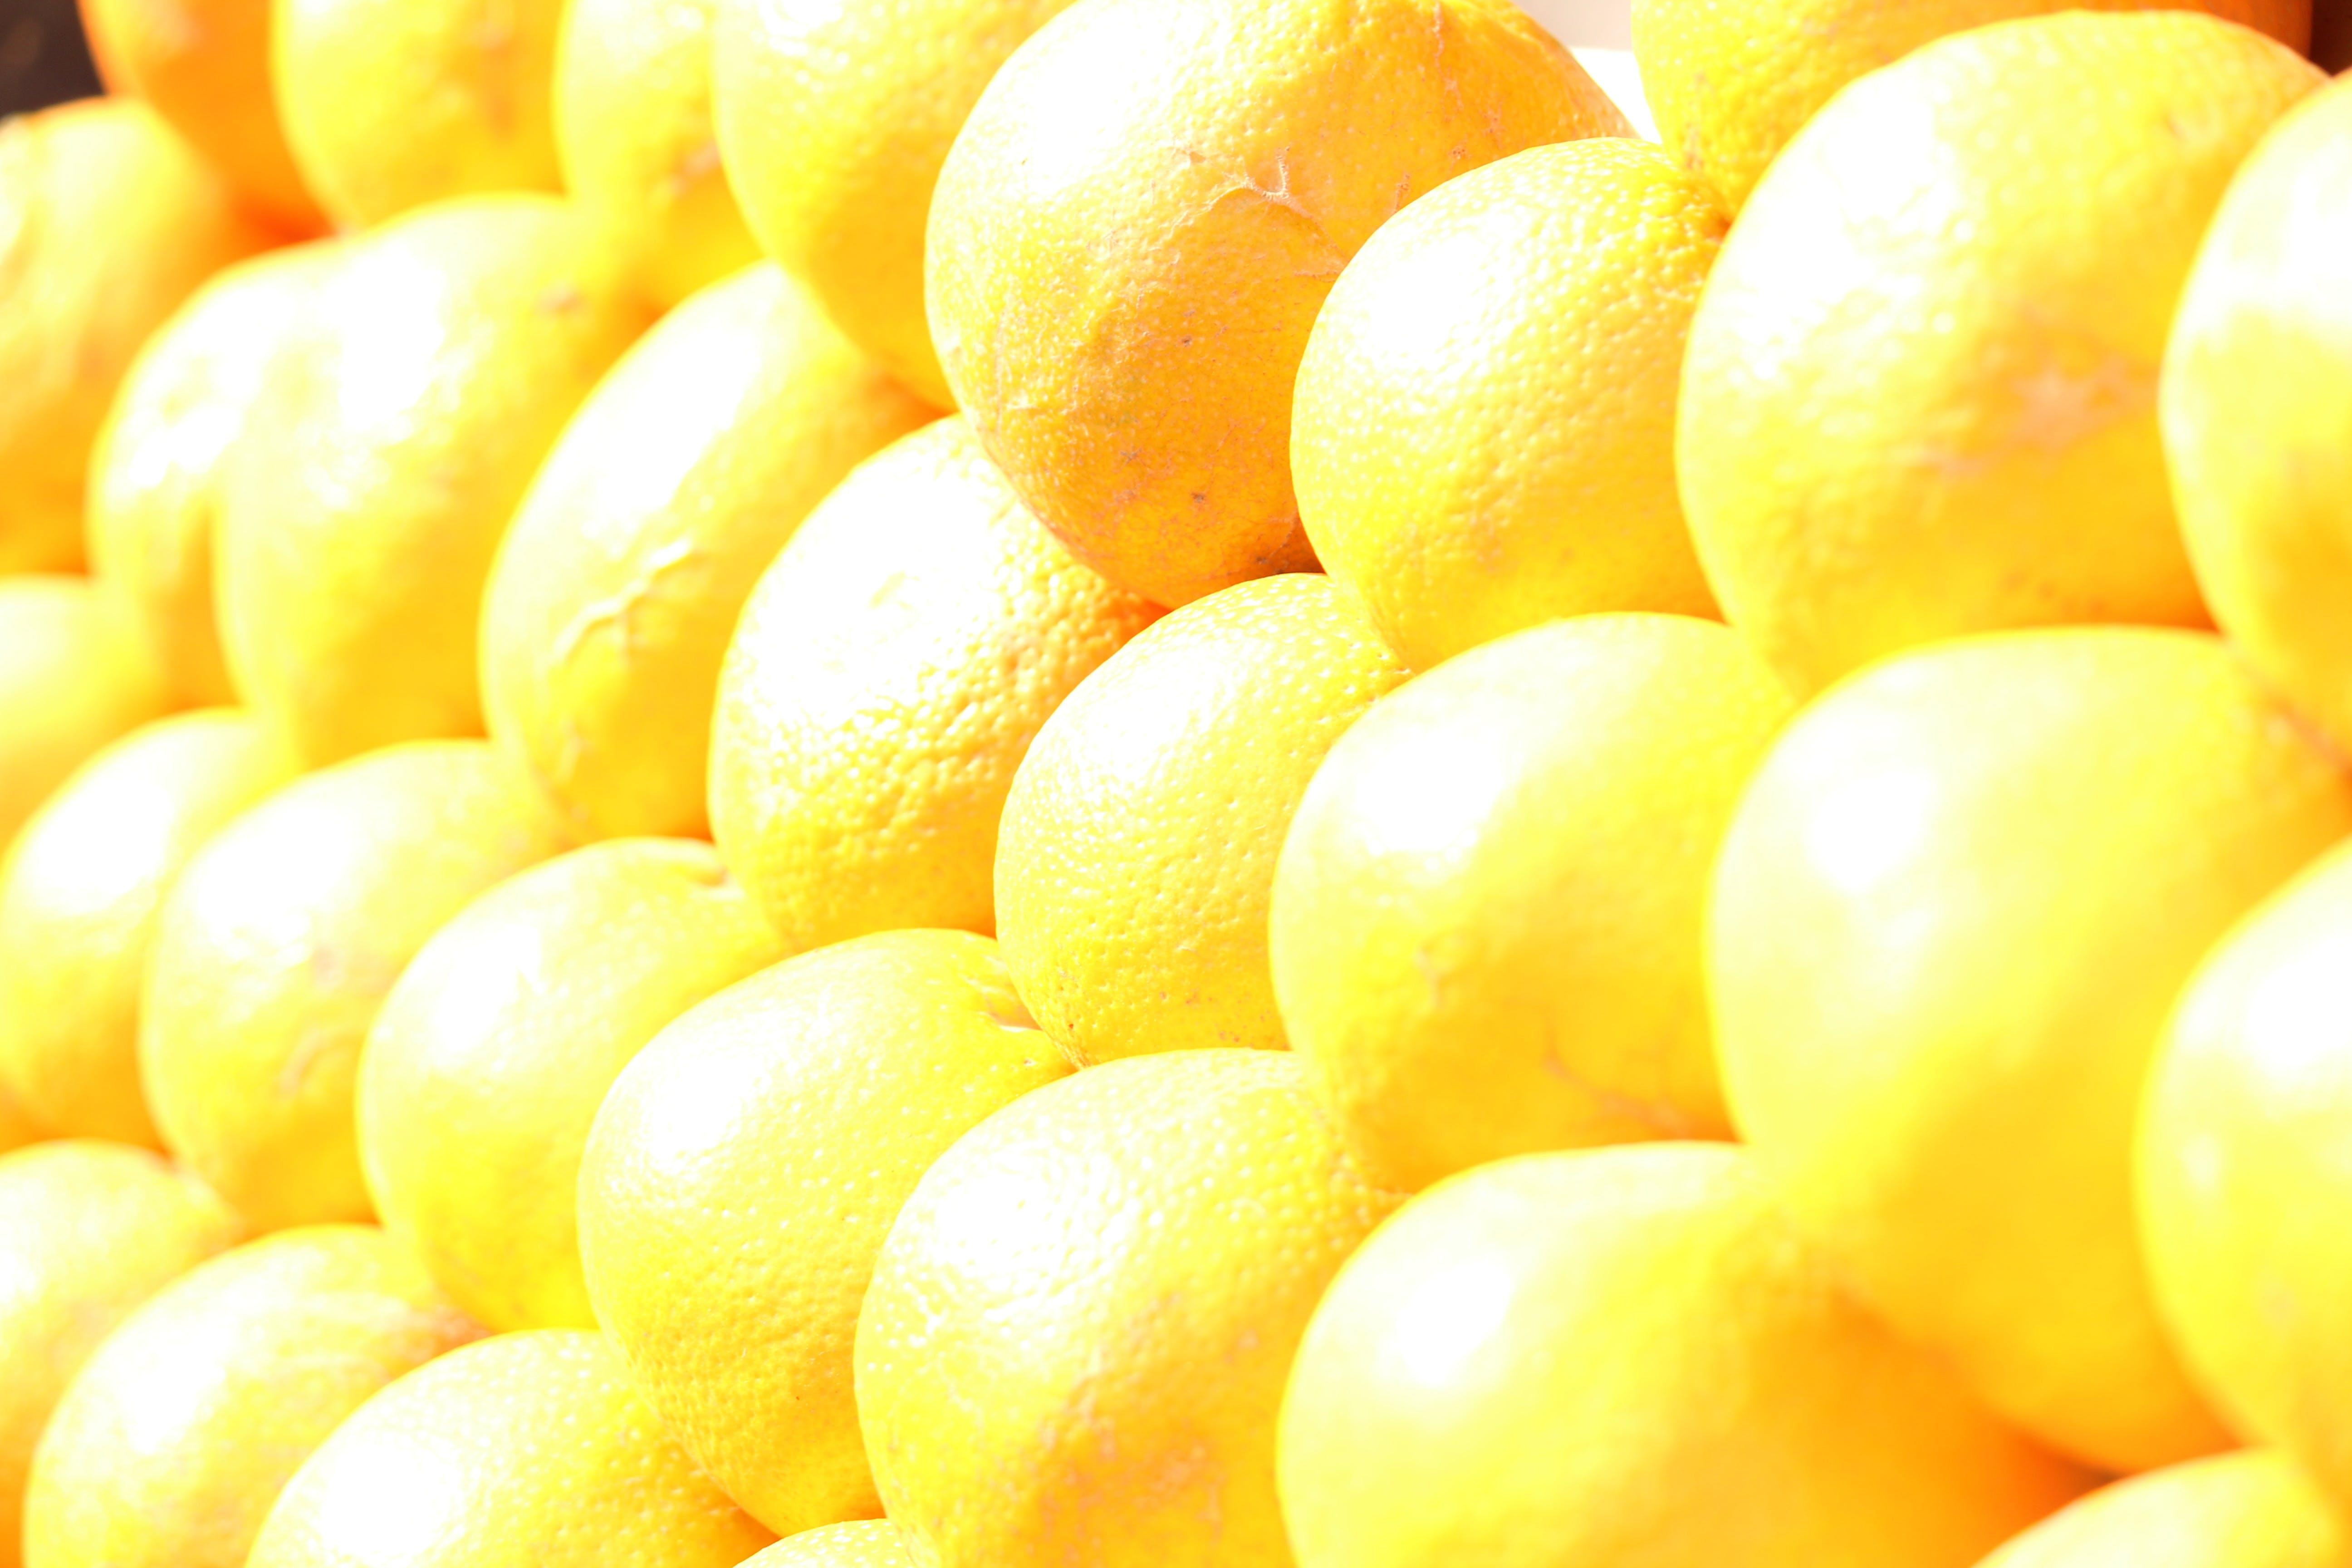 Free stock photo of citrus fruit, fruit, orange, oranges